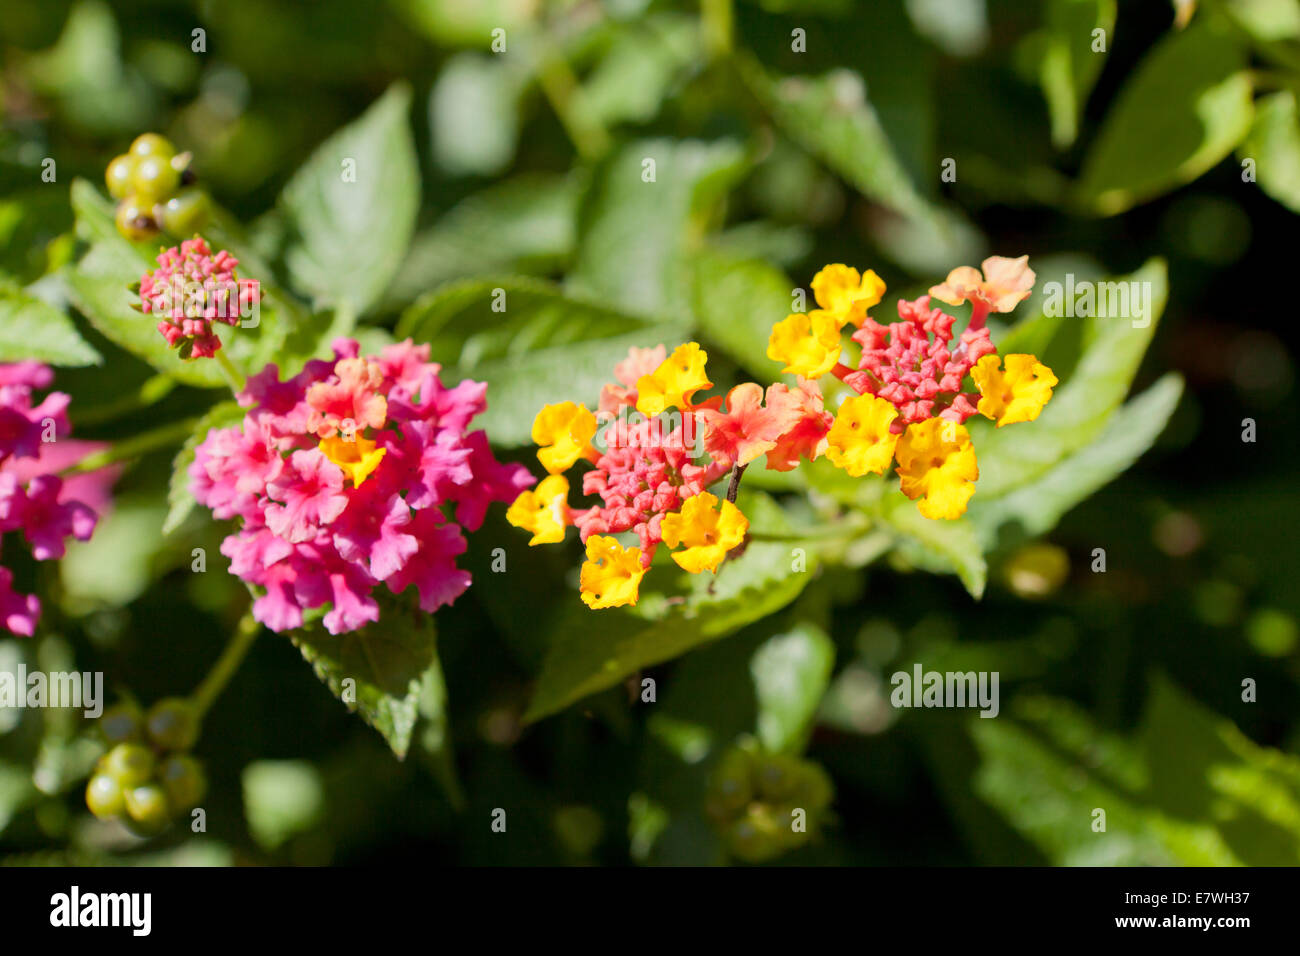 Lantana flowers (Lantana camara) - Stock Image